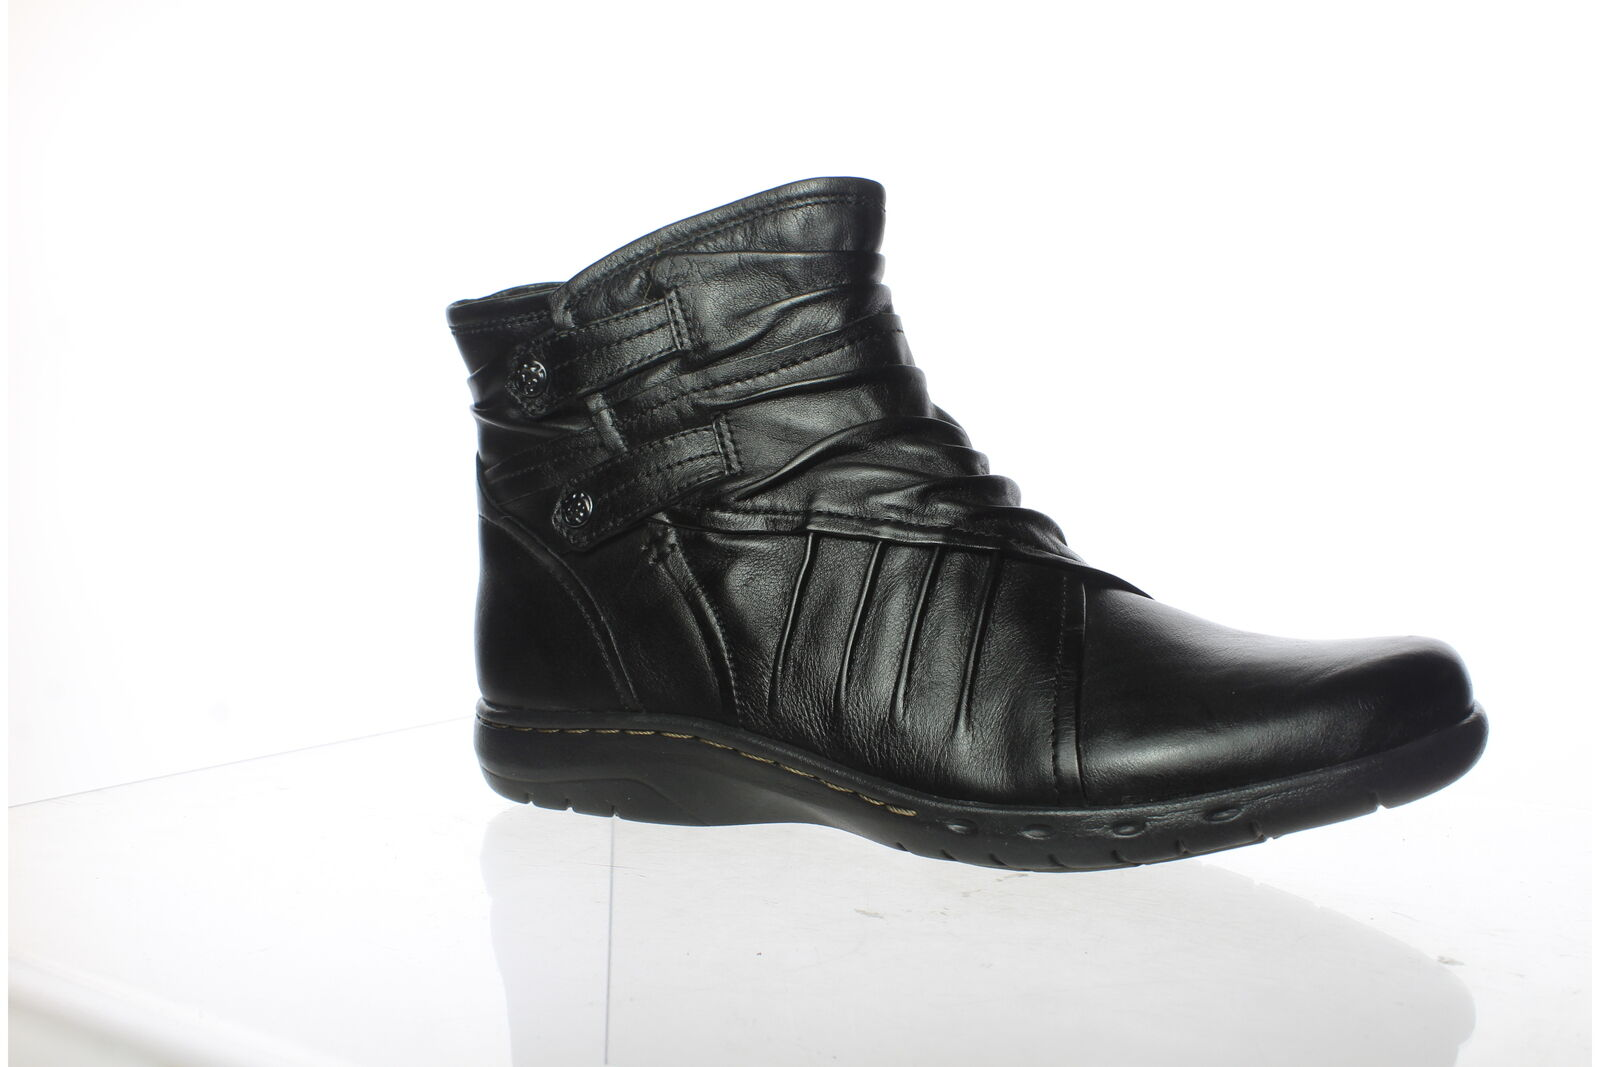 Cobb Hill Womens Pandora Black Ankle Boots Size 8.5 (Narrow) (1467572)